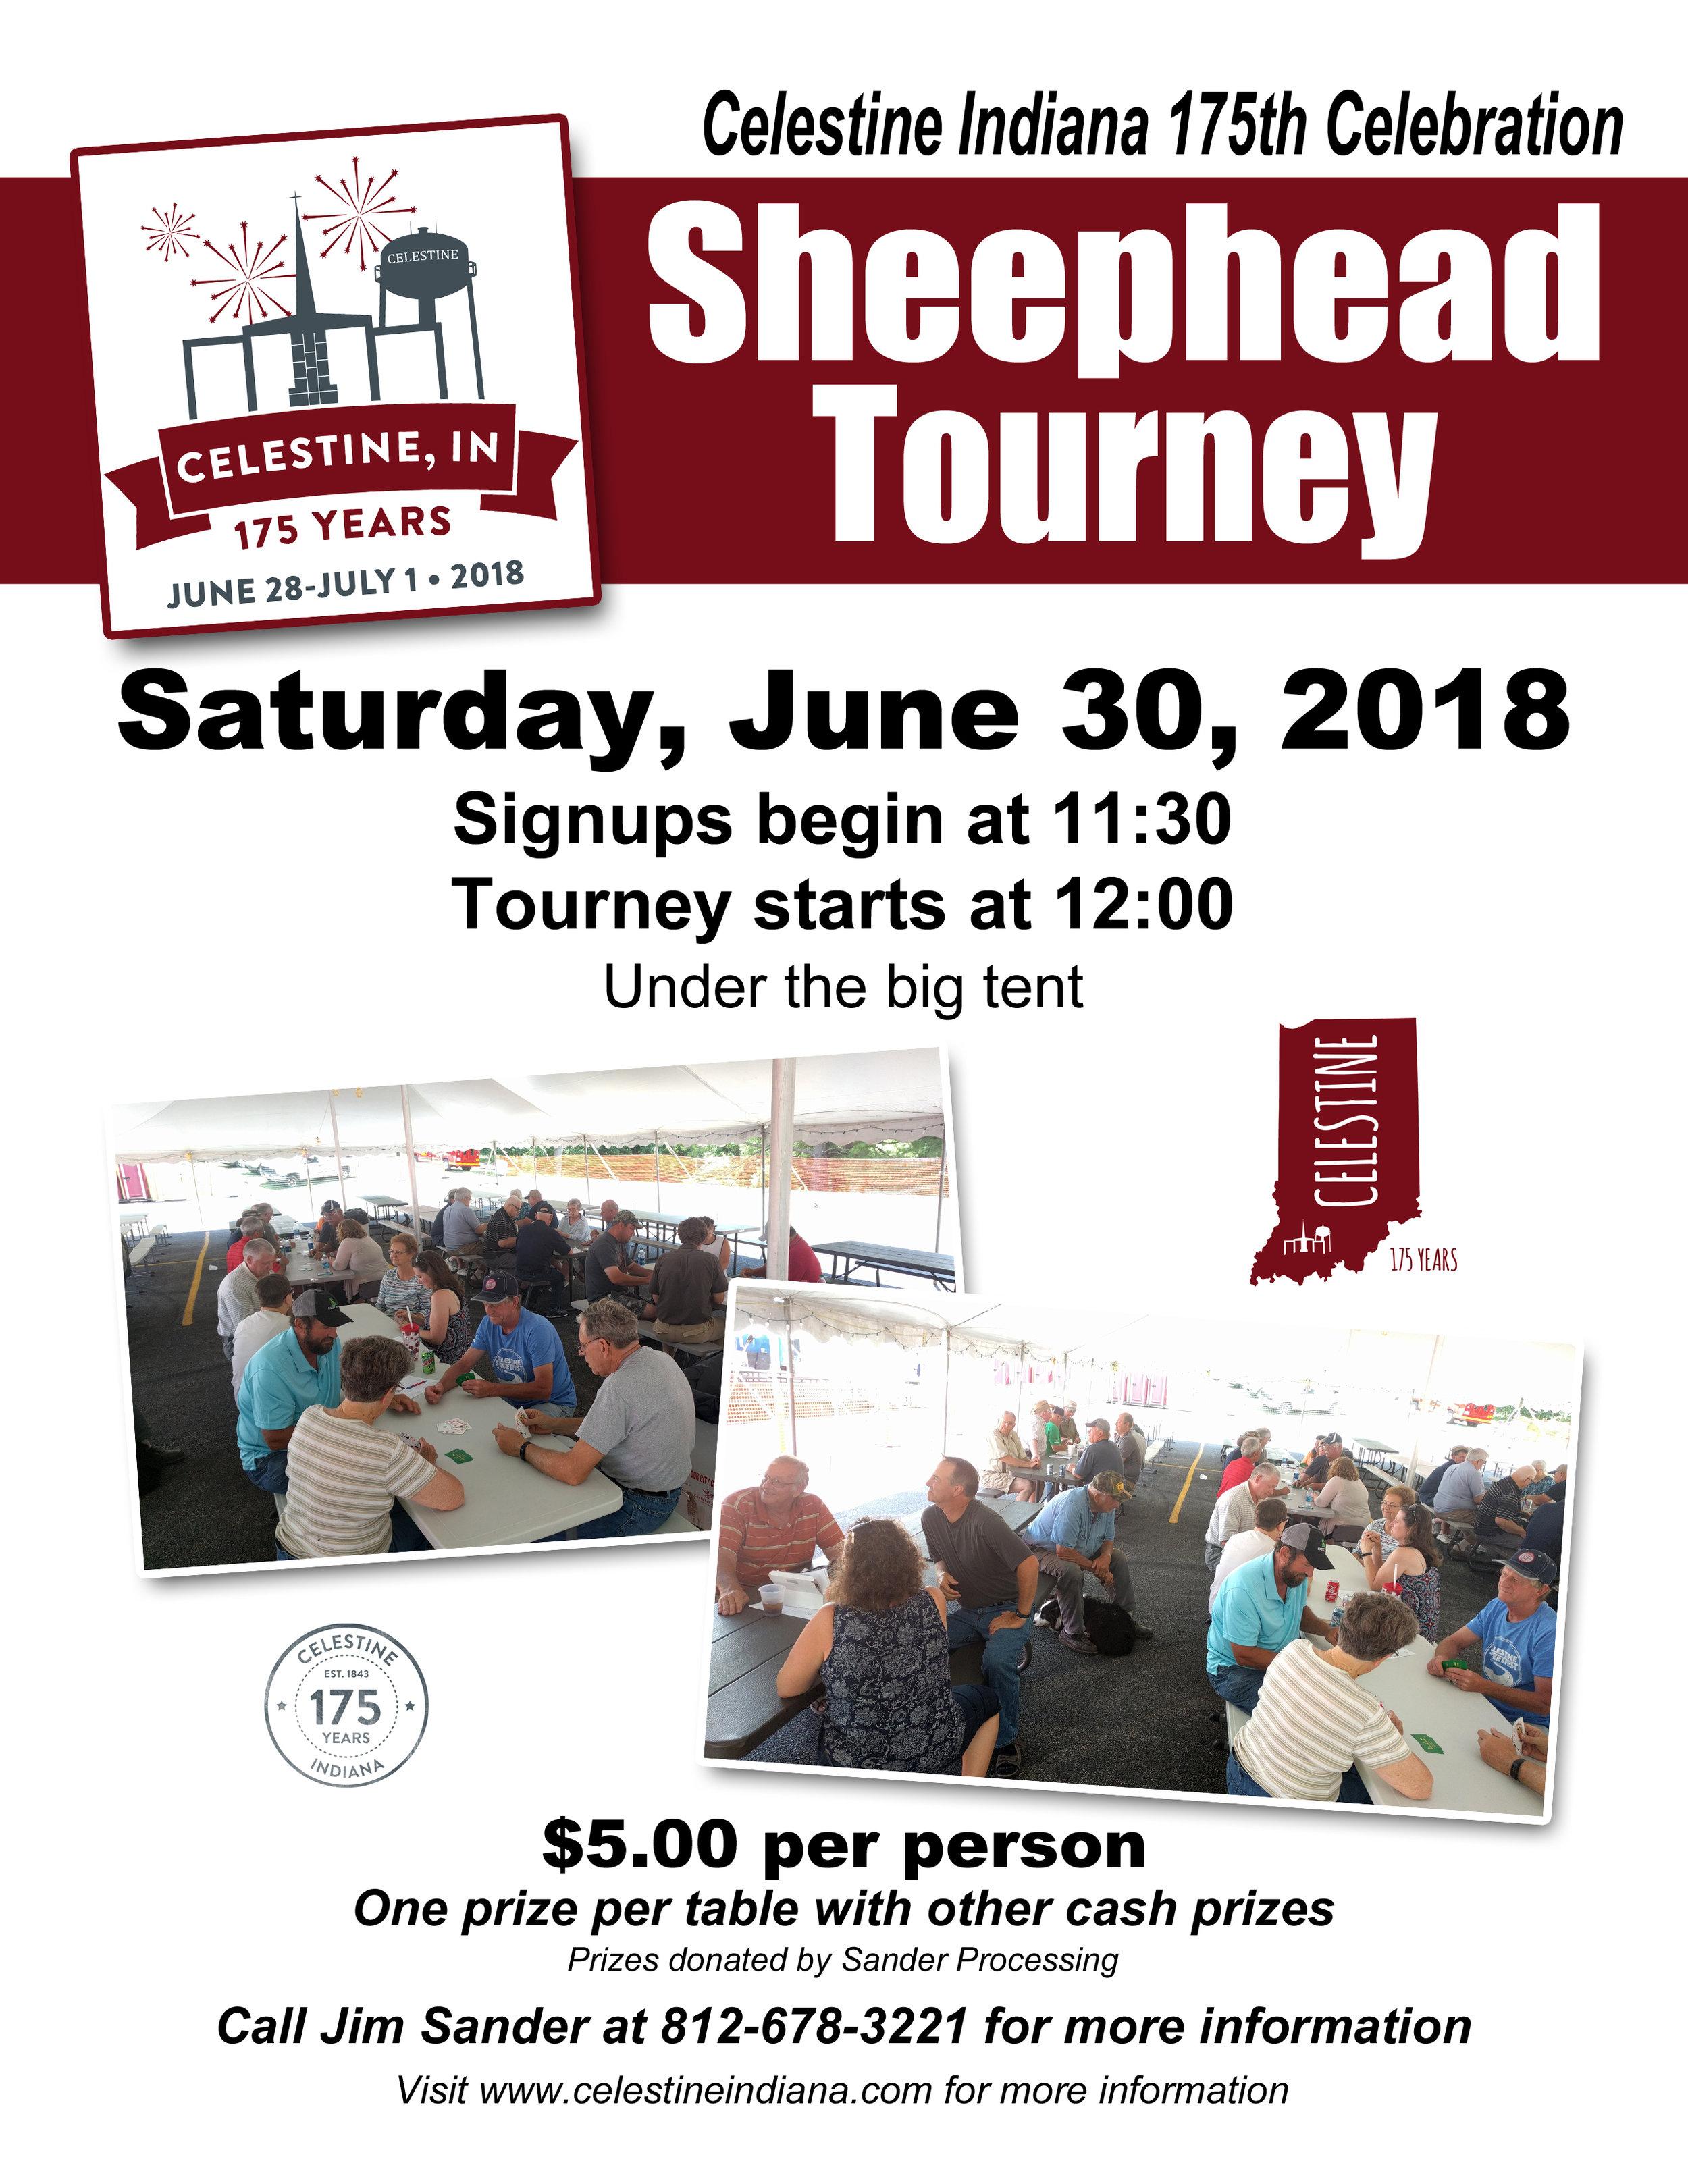 Sheephead Tourney-New Correct One.jpg